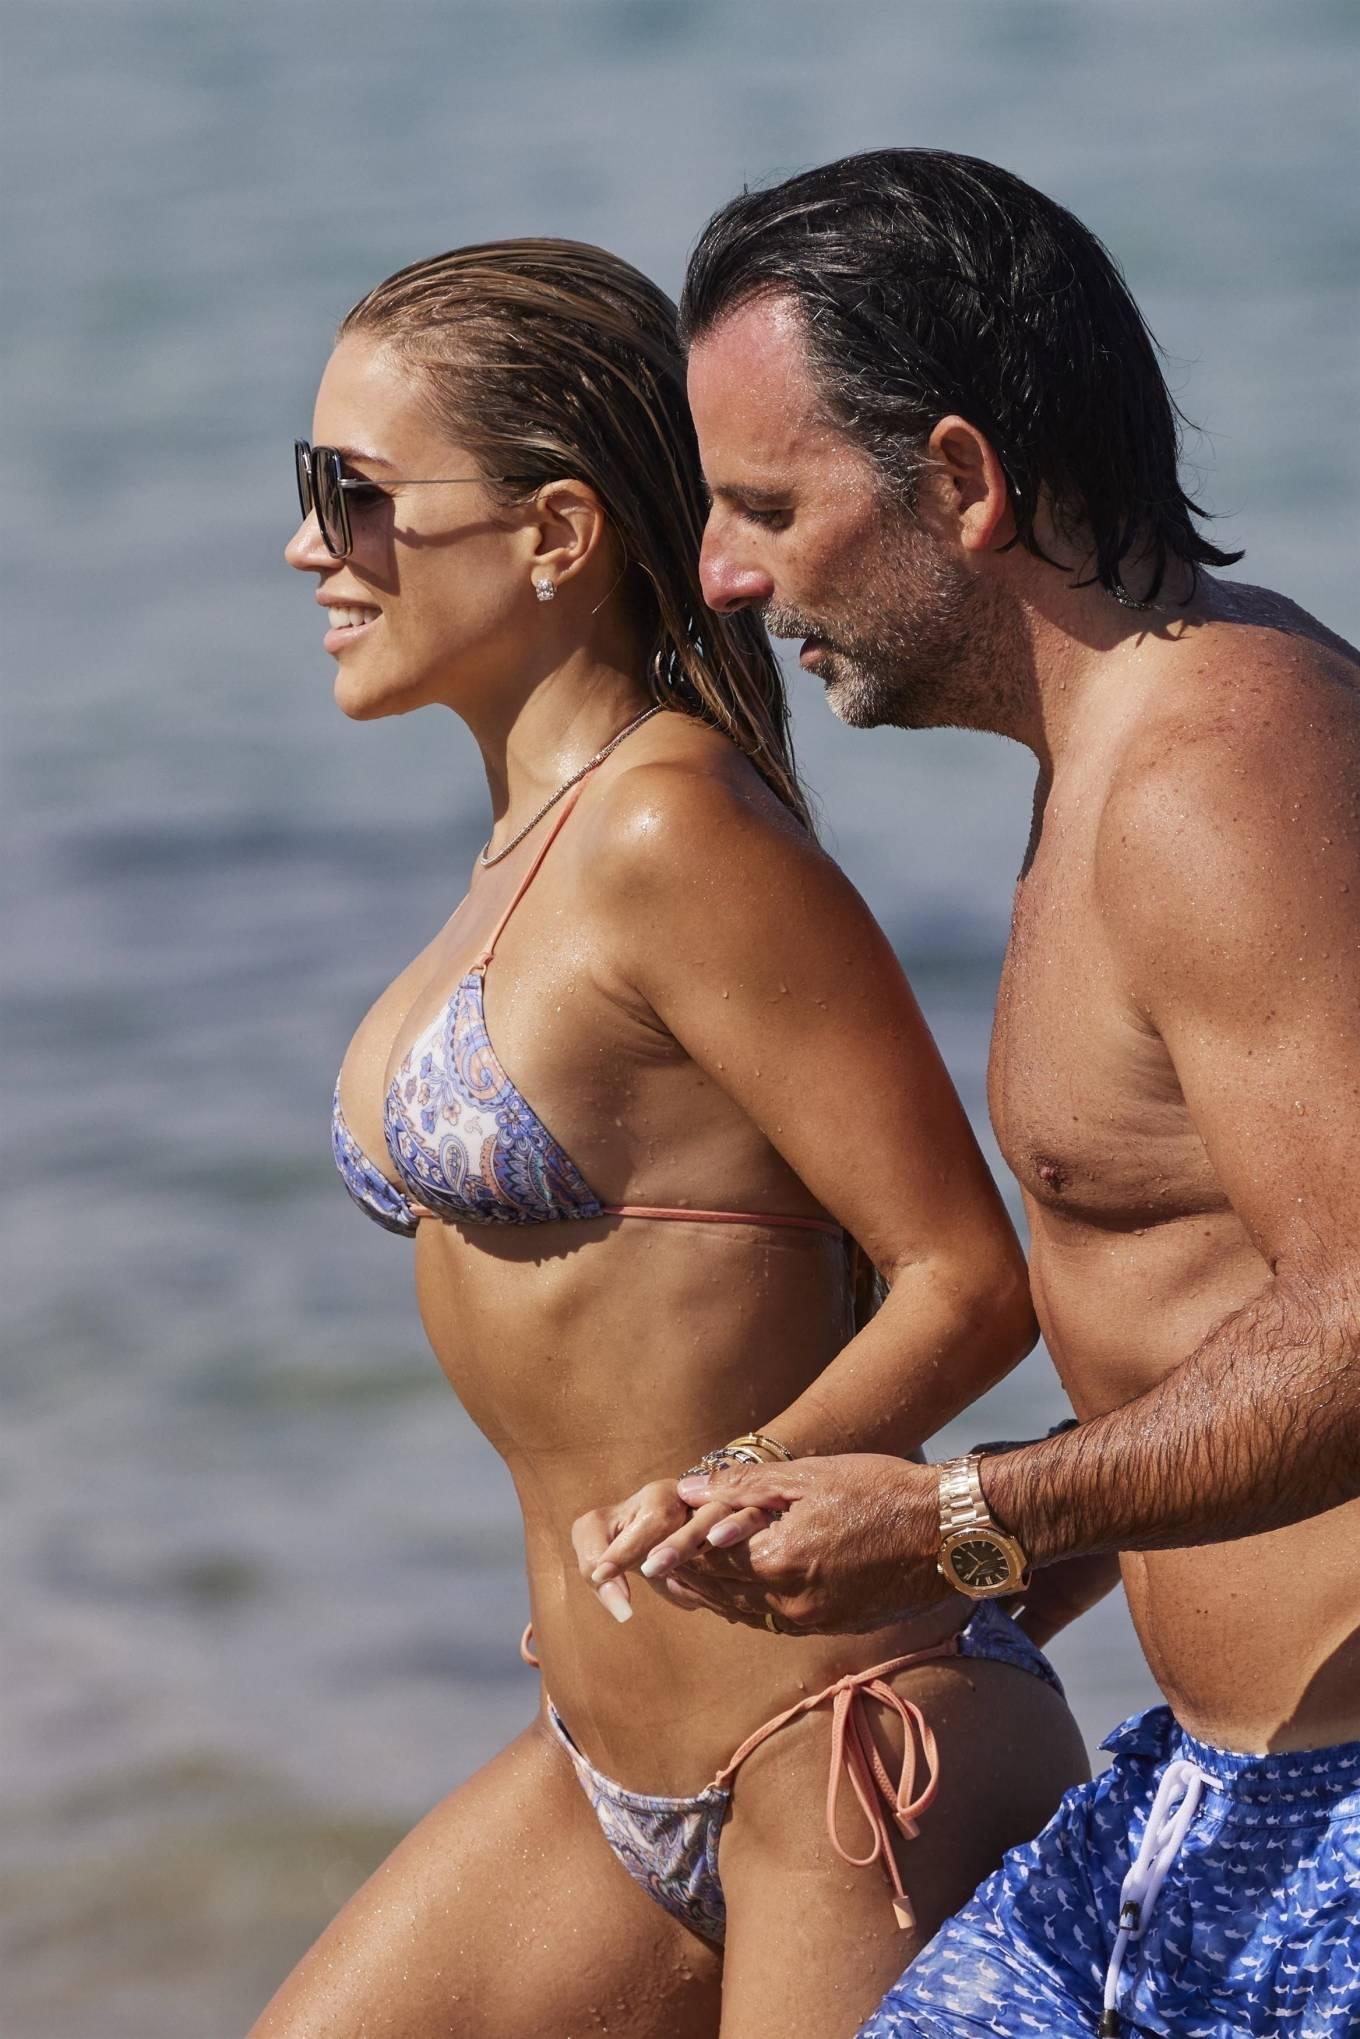 Sylvie Meis 2021 : Sylvie Meis – In a bikini with her husband Niclas Castello on the beach La Réserve in Ramatuelle-25